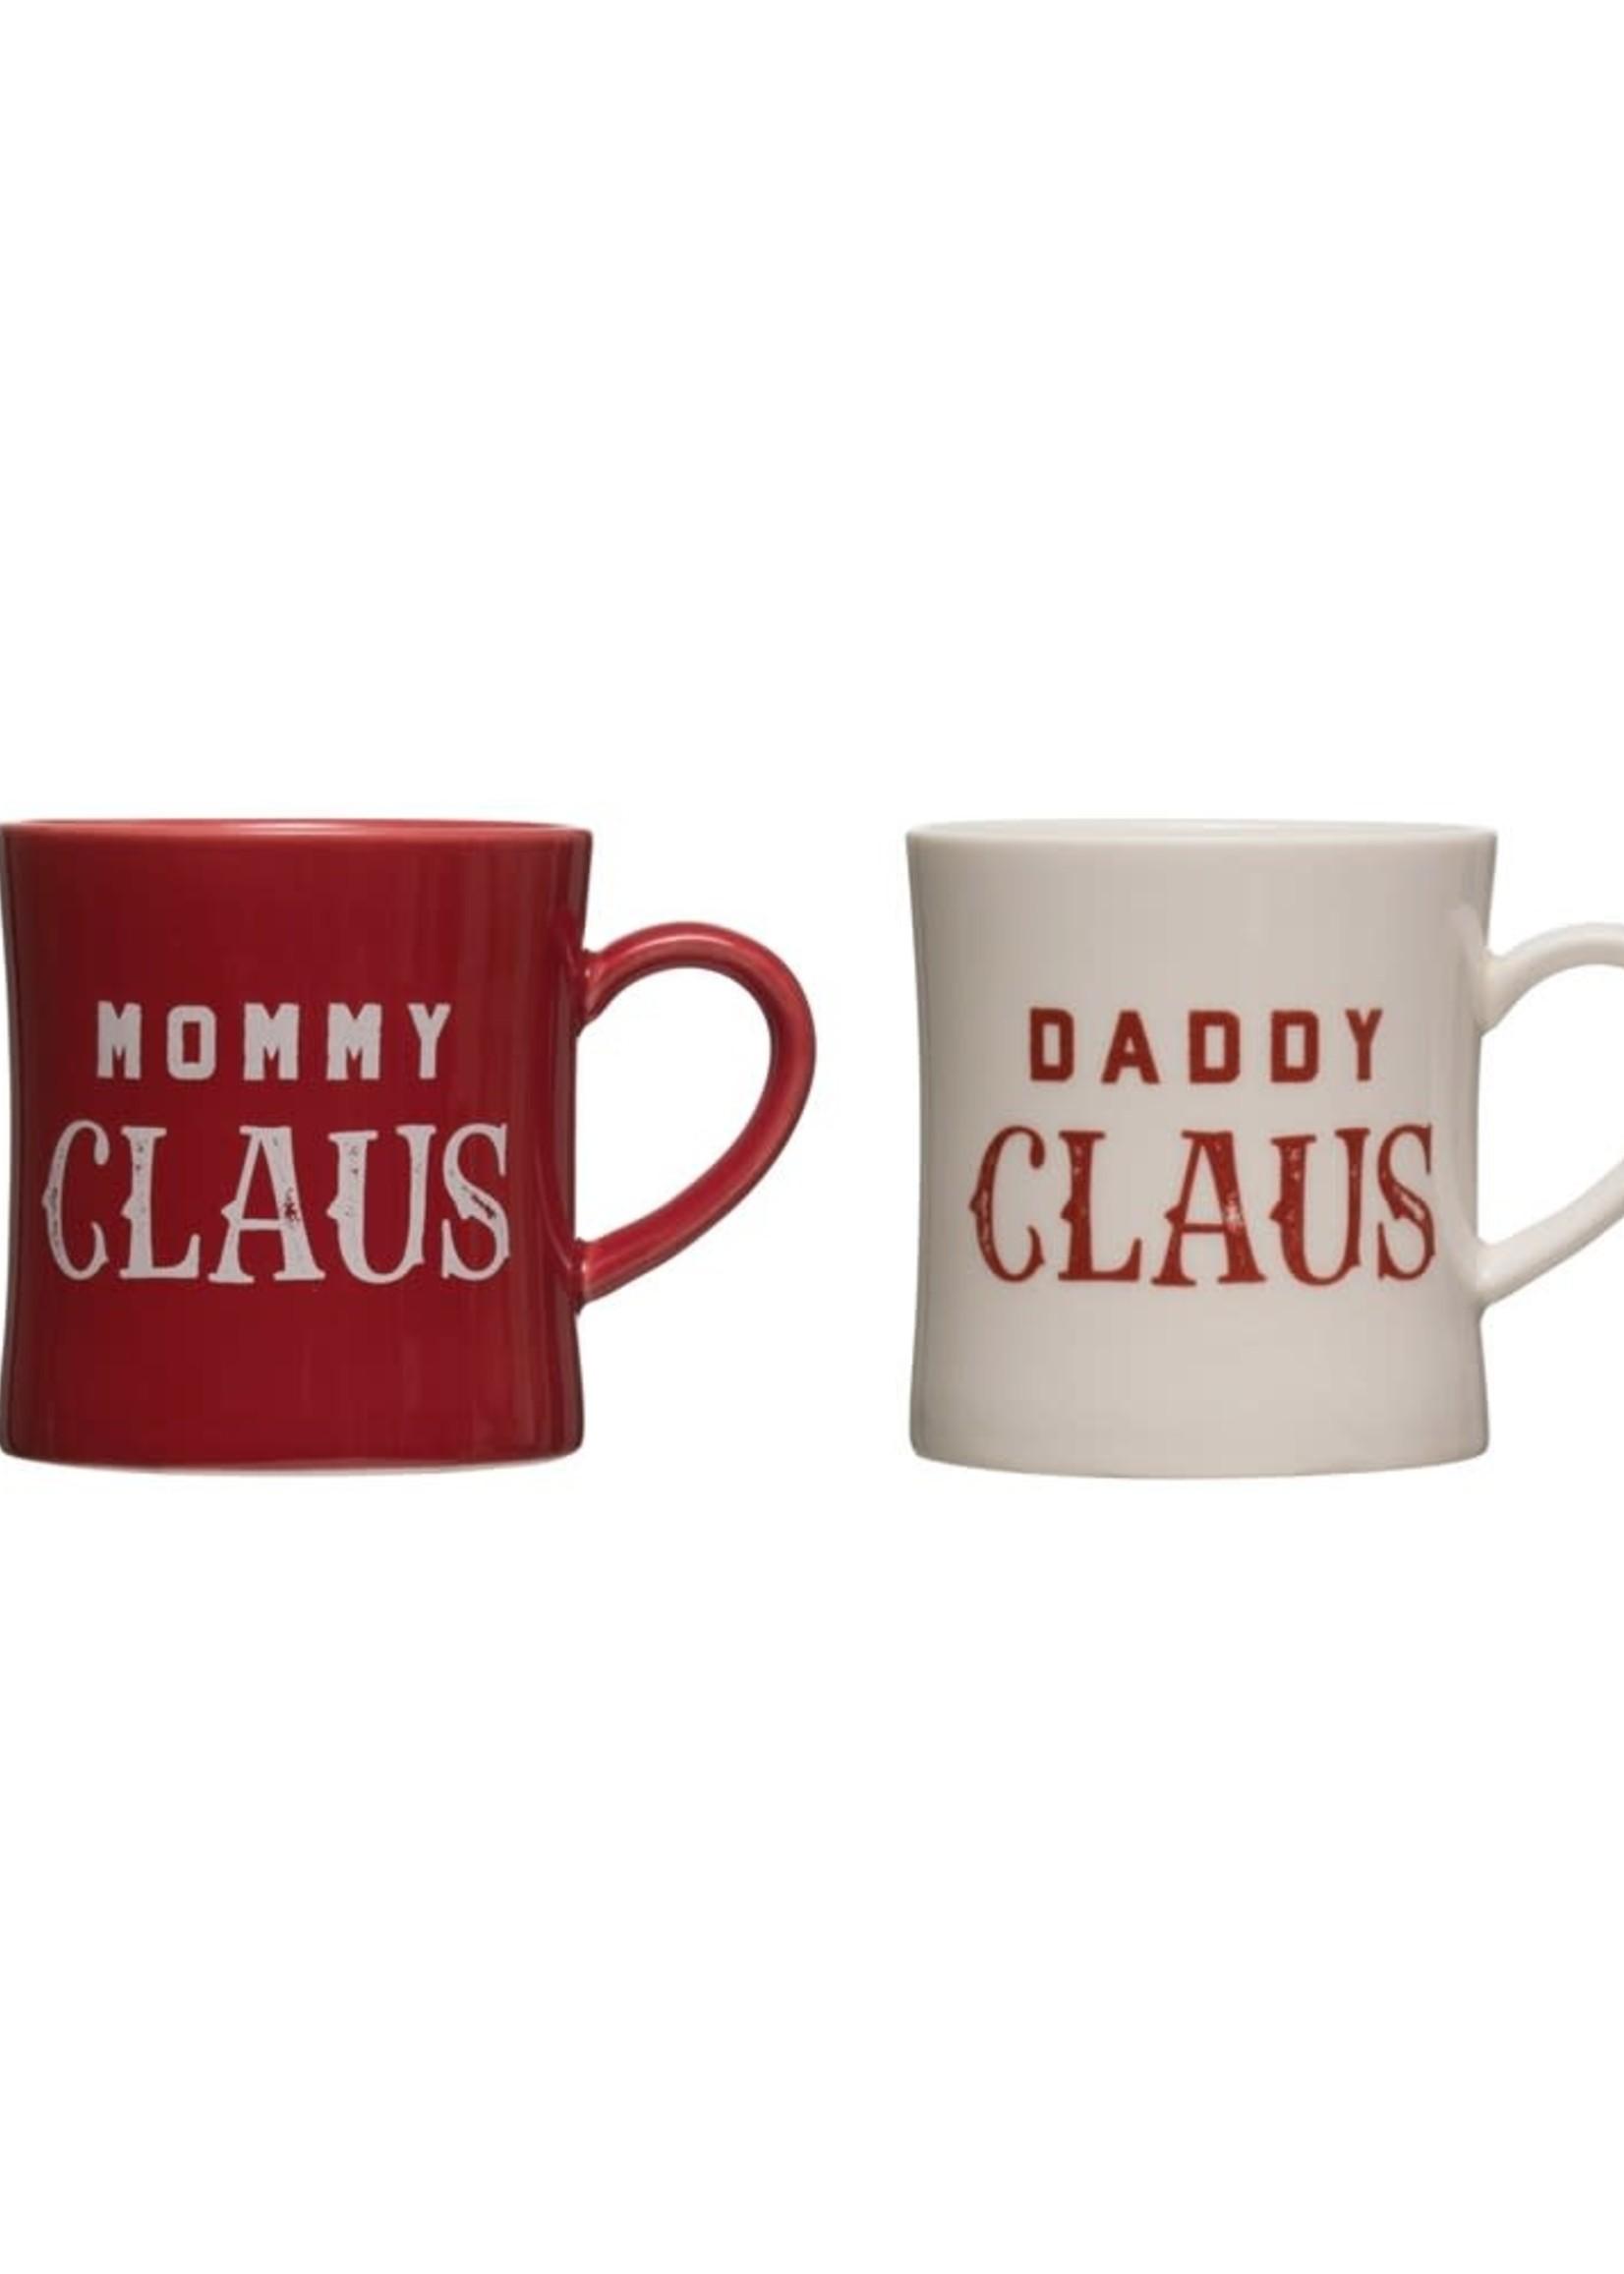 "3-1/2"" Round x 4""H 16 oz. Stoneware Mug, 2 Styles ""Mommy/Daddy Claus"